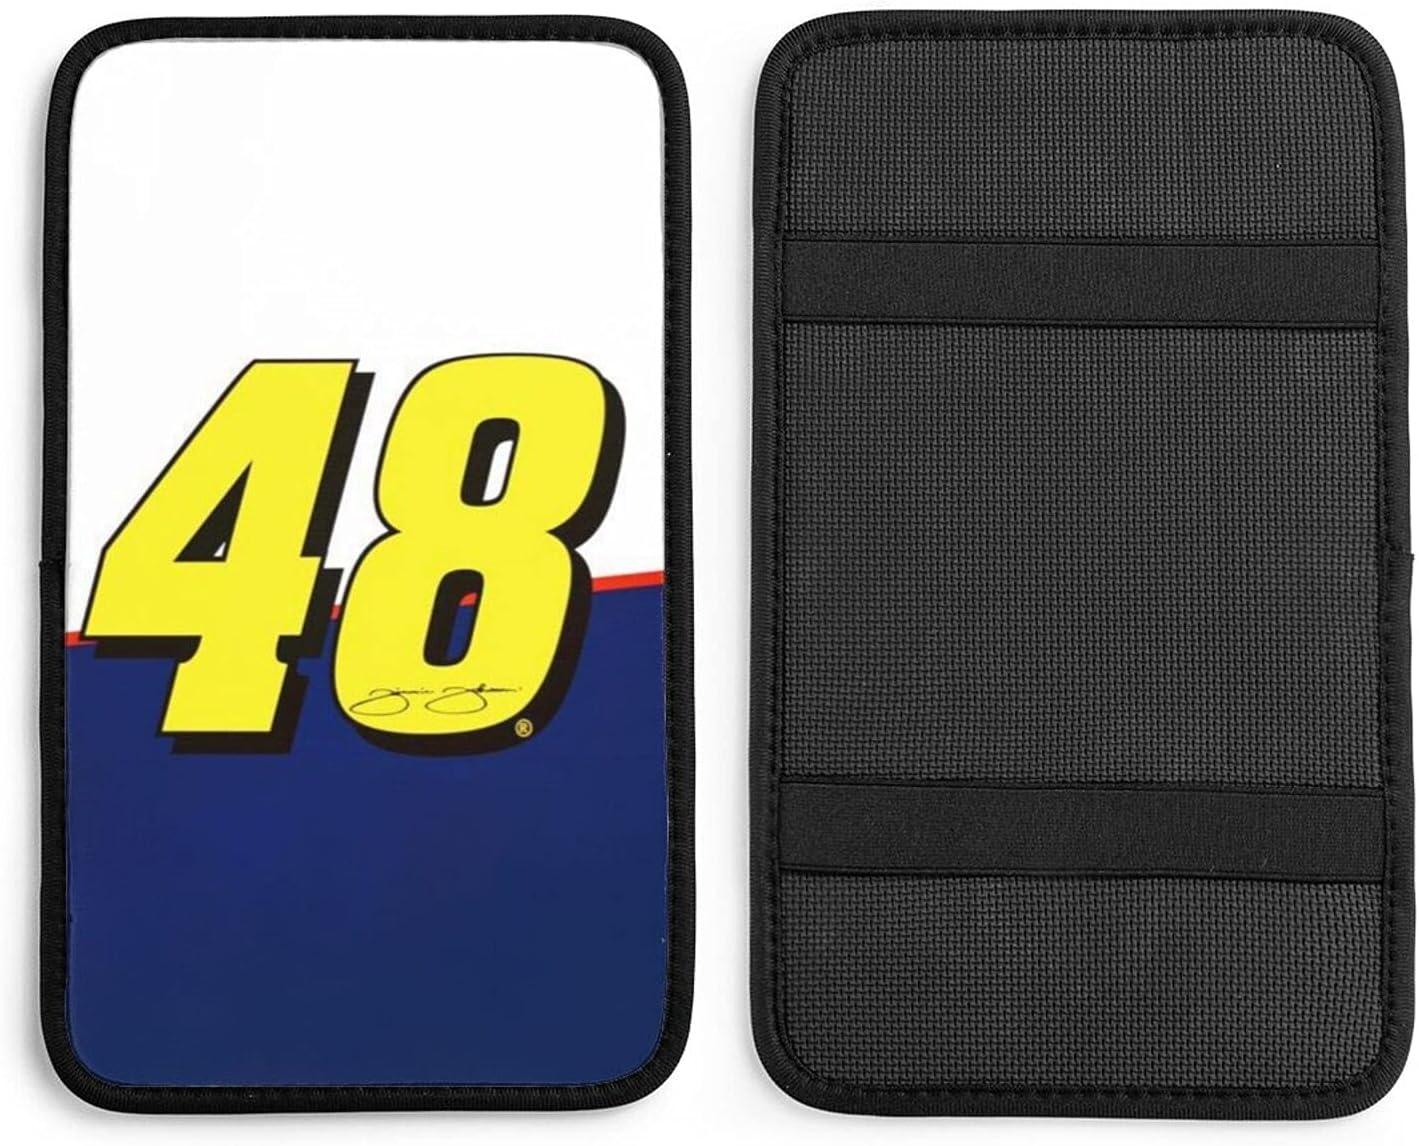 Jimmie-Johnson #48 Auto Max 78% OFF Center Console Regular dealer Cove Box Armrest Seat Pad